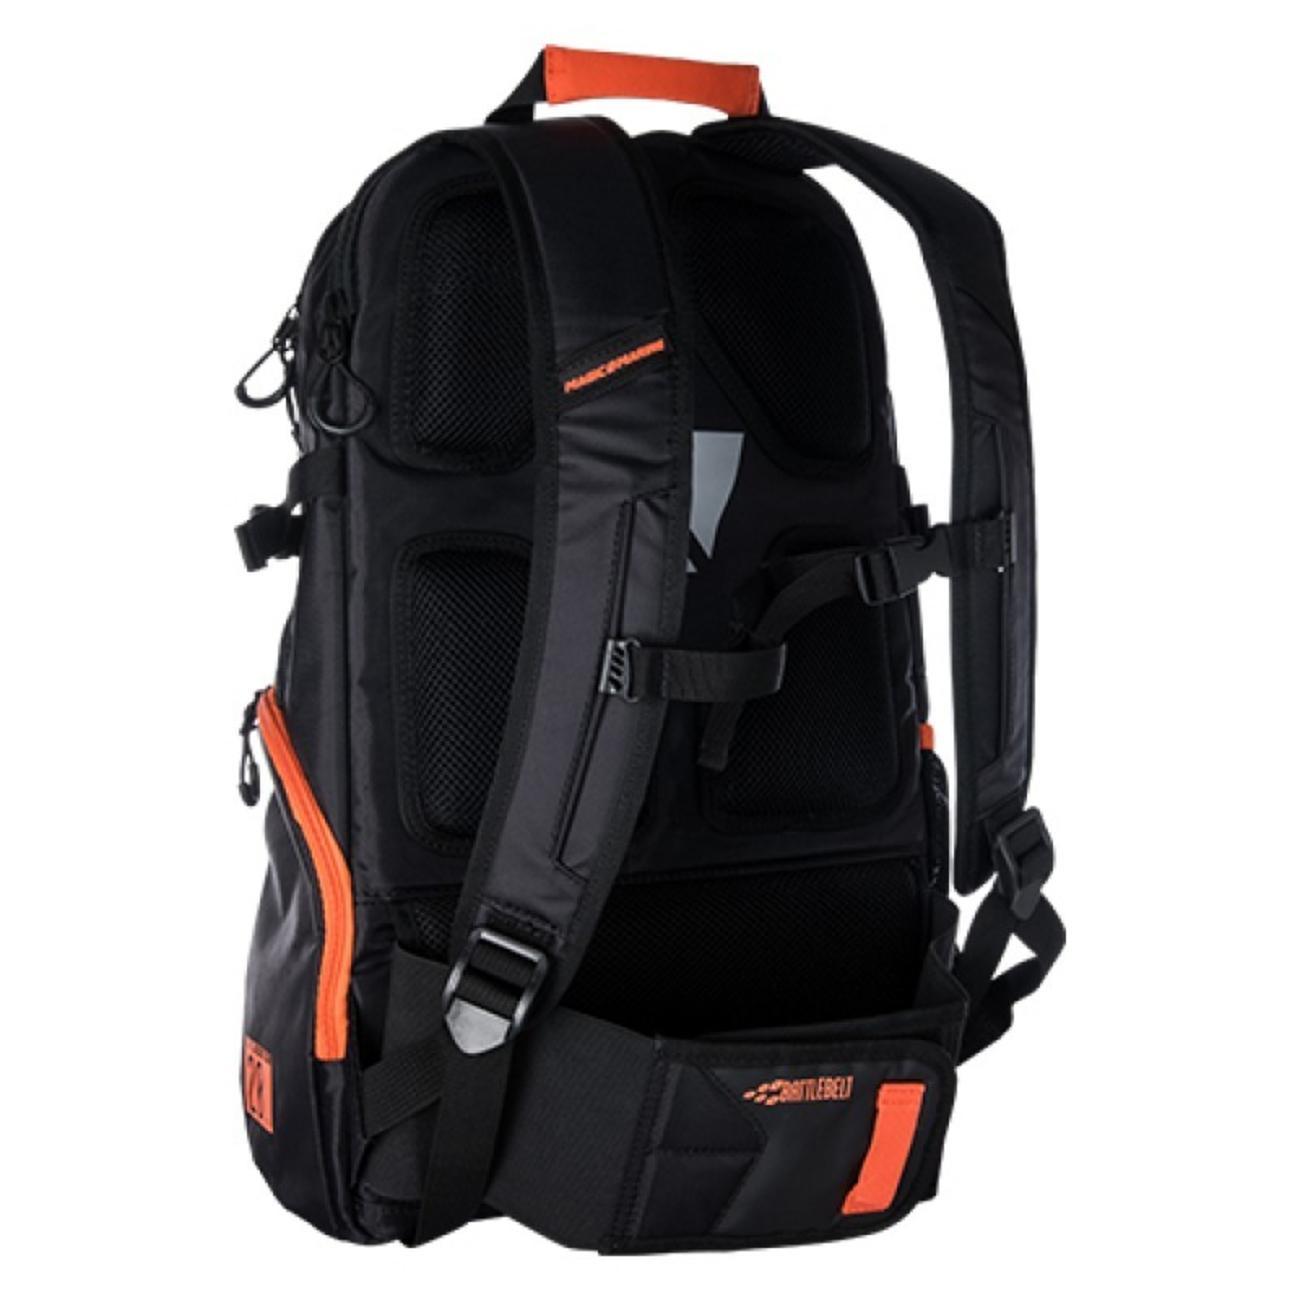 Backpack 20L バックパック クッション付きPCリュック